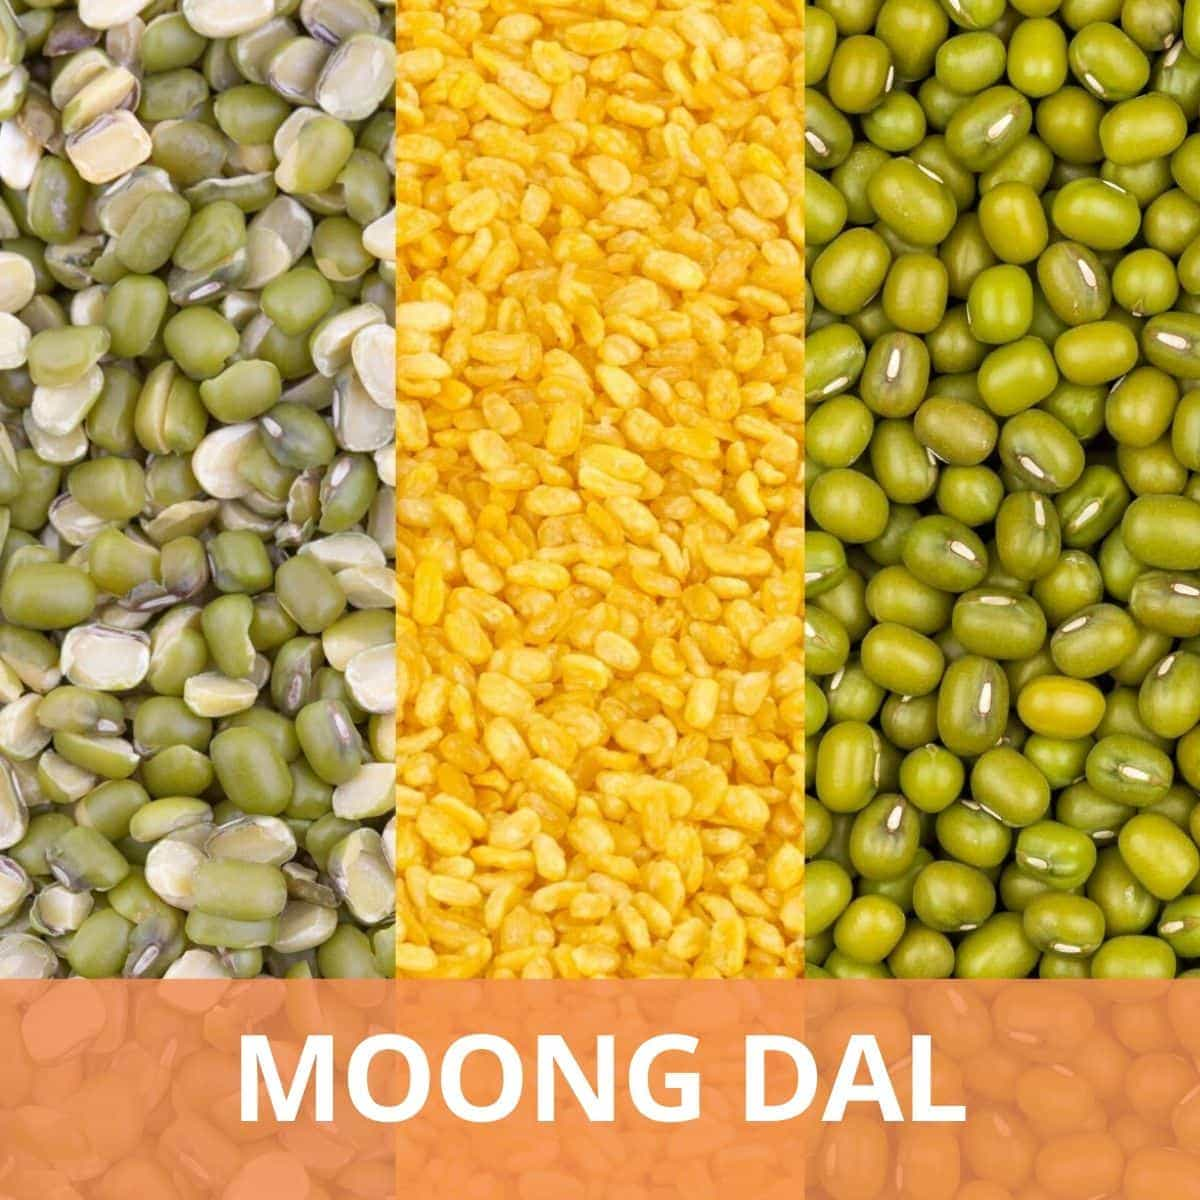 Moong Dal